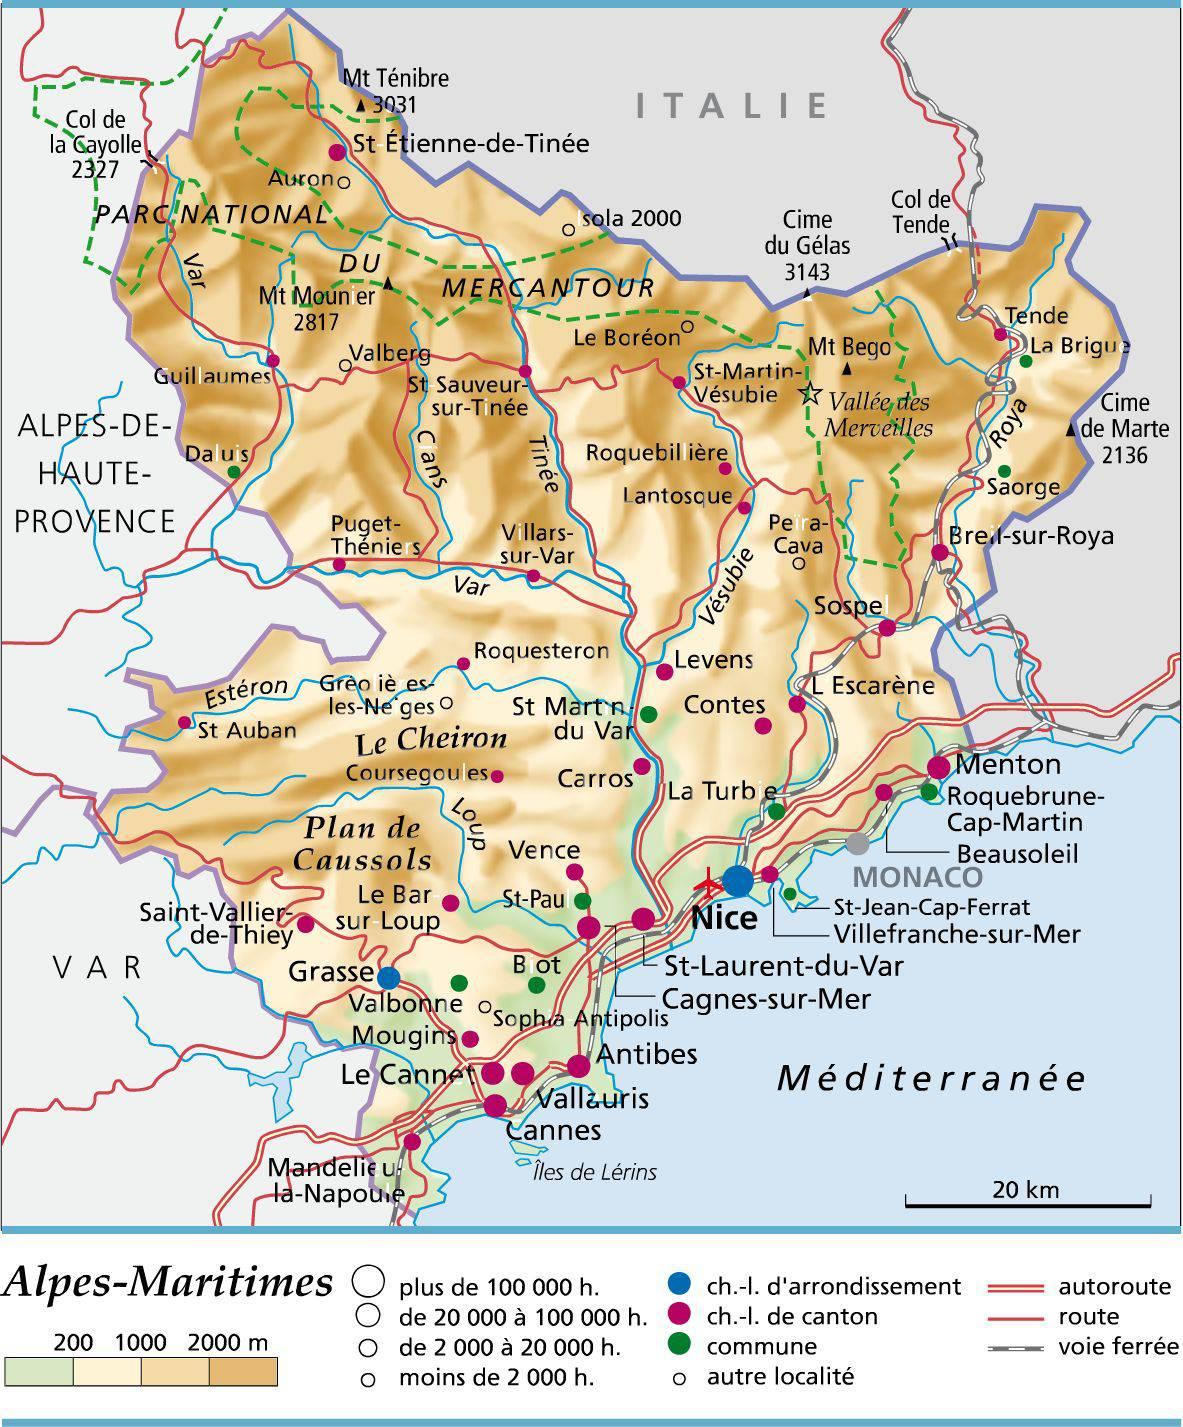 Carte administrative des Alpes-Maritime